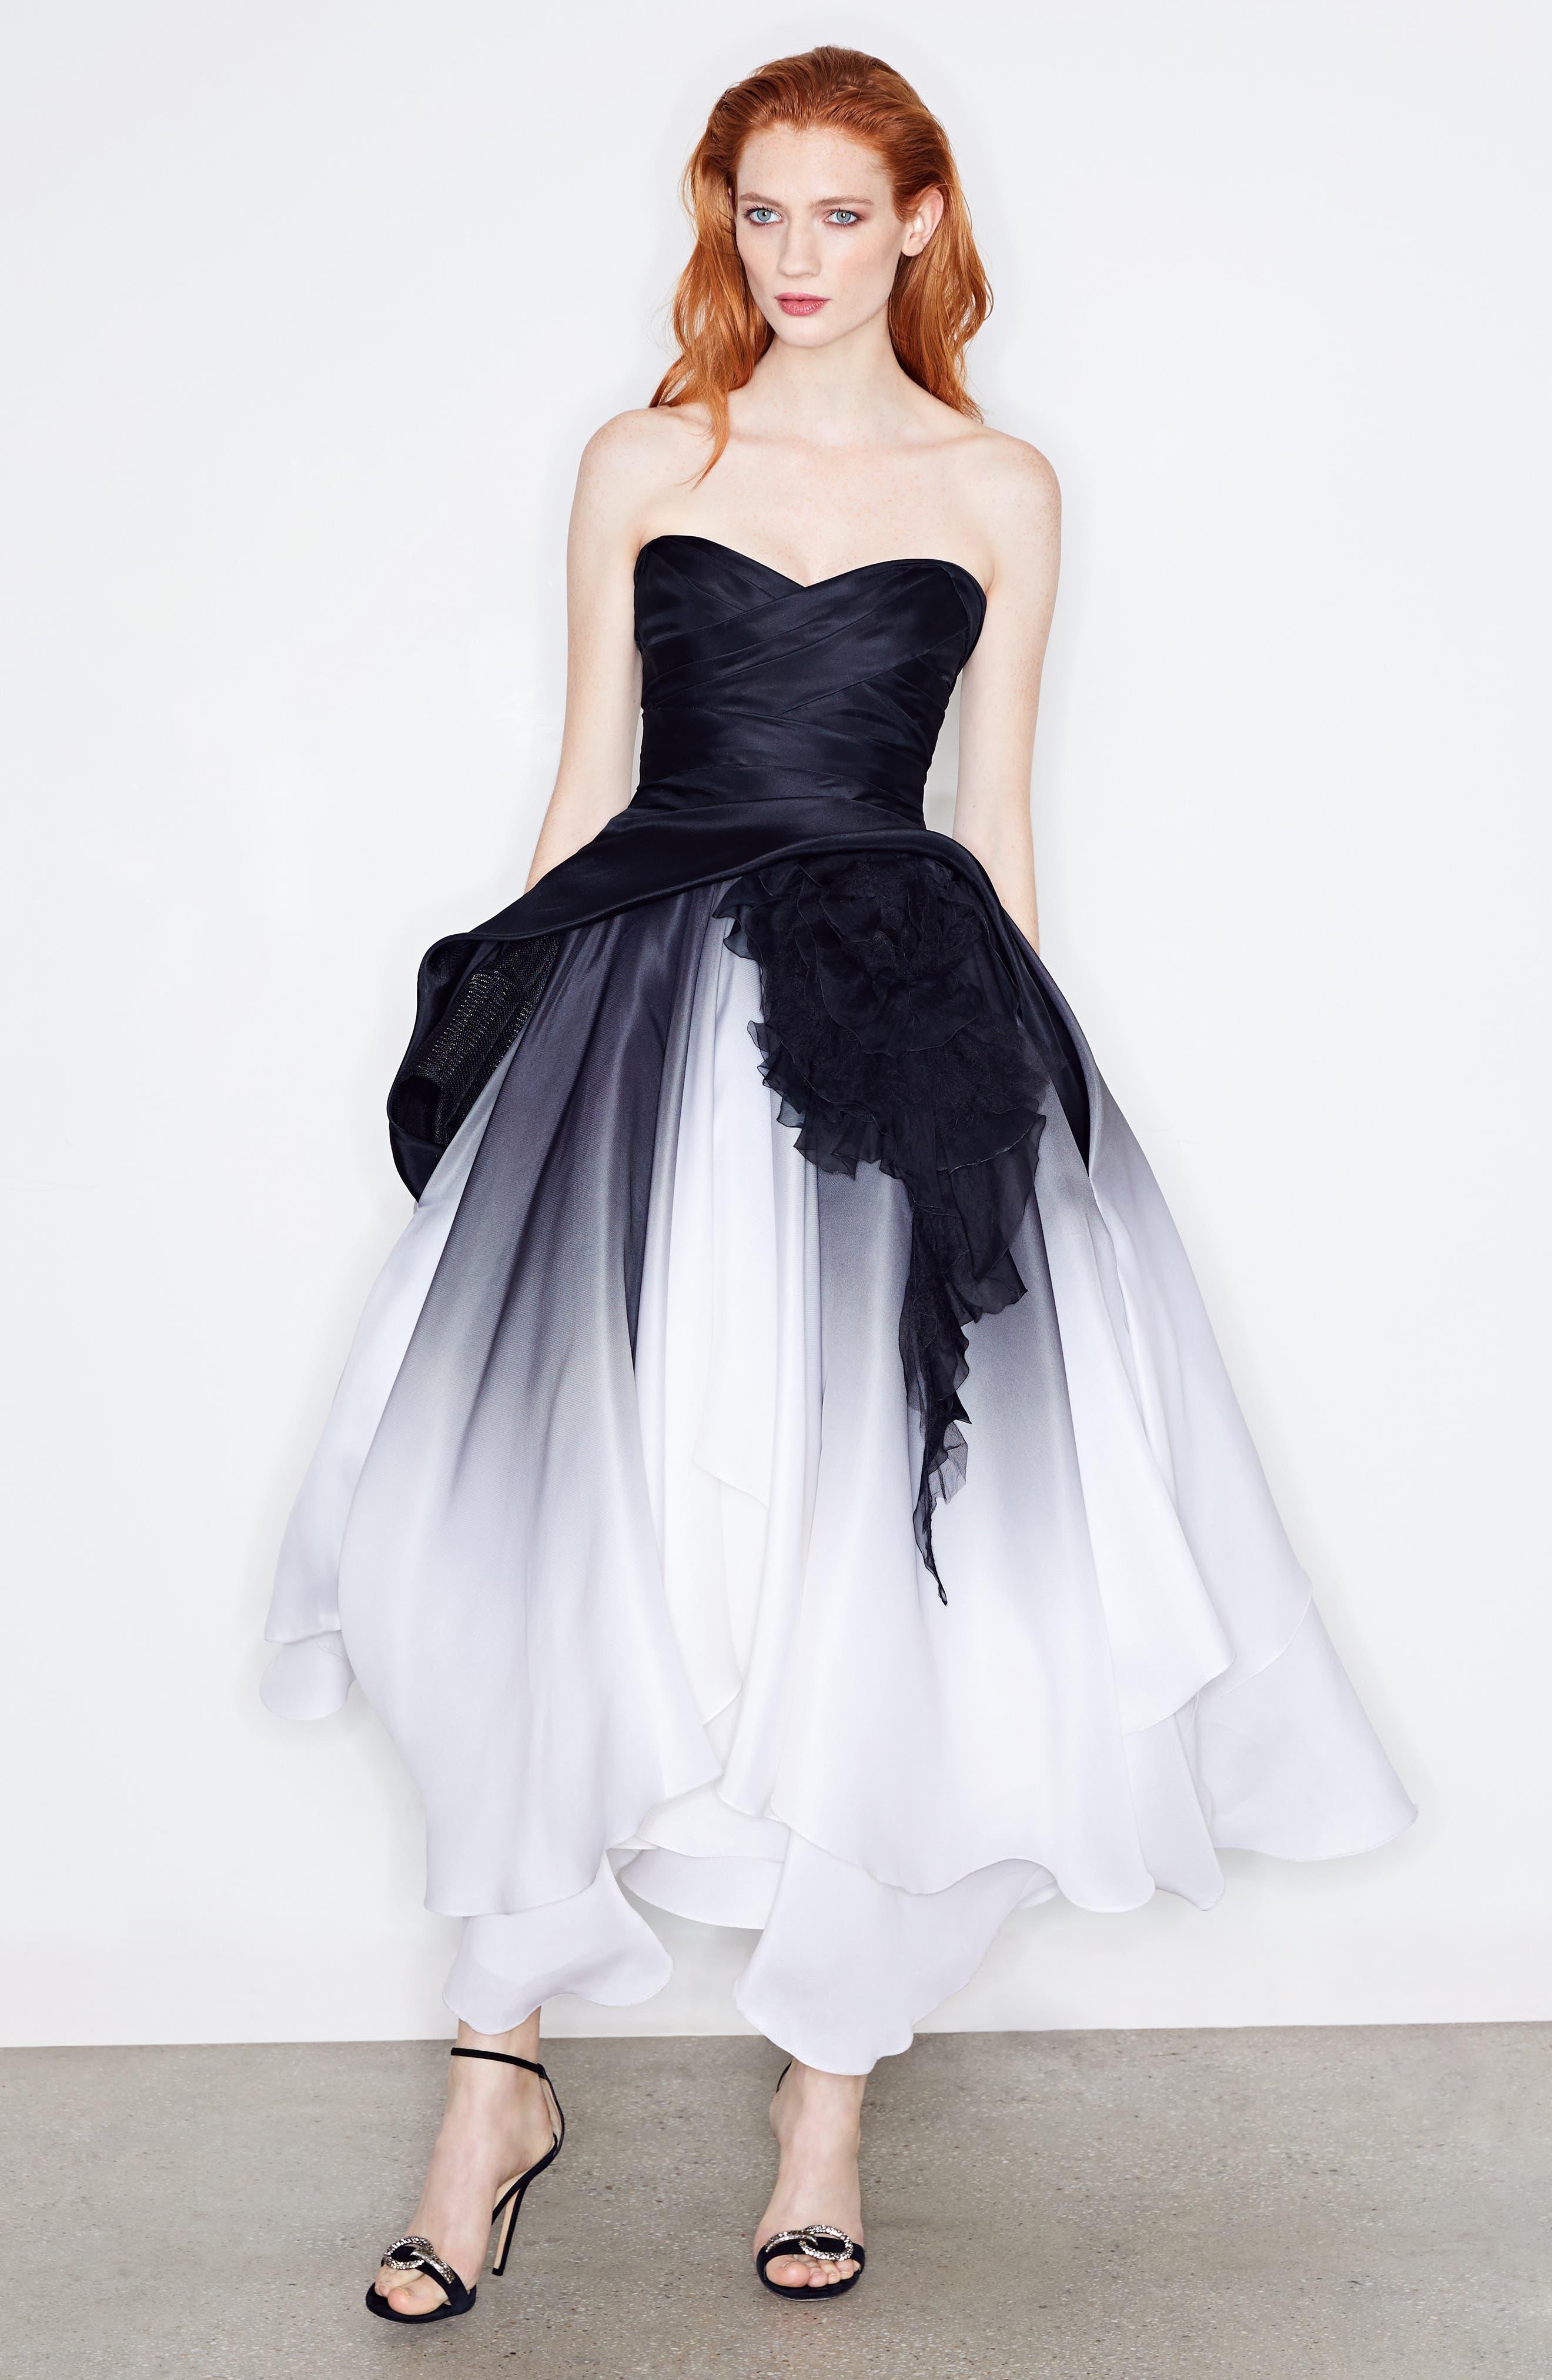 Ombré Strapless Tea Length Dress,                             Alternate thumbnail 2, color,                             Black/ White